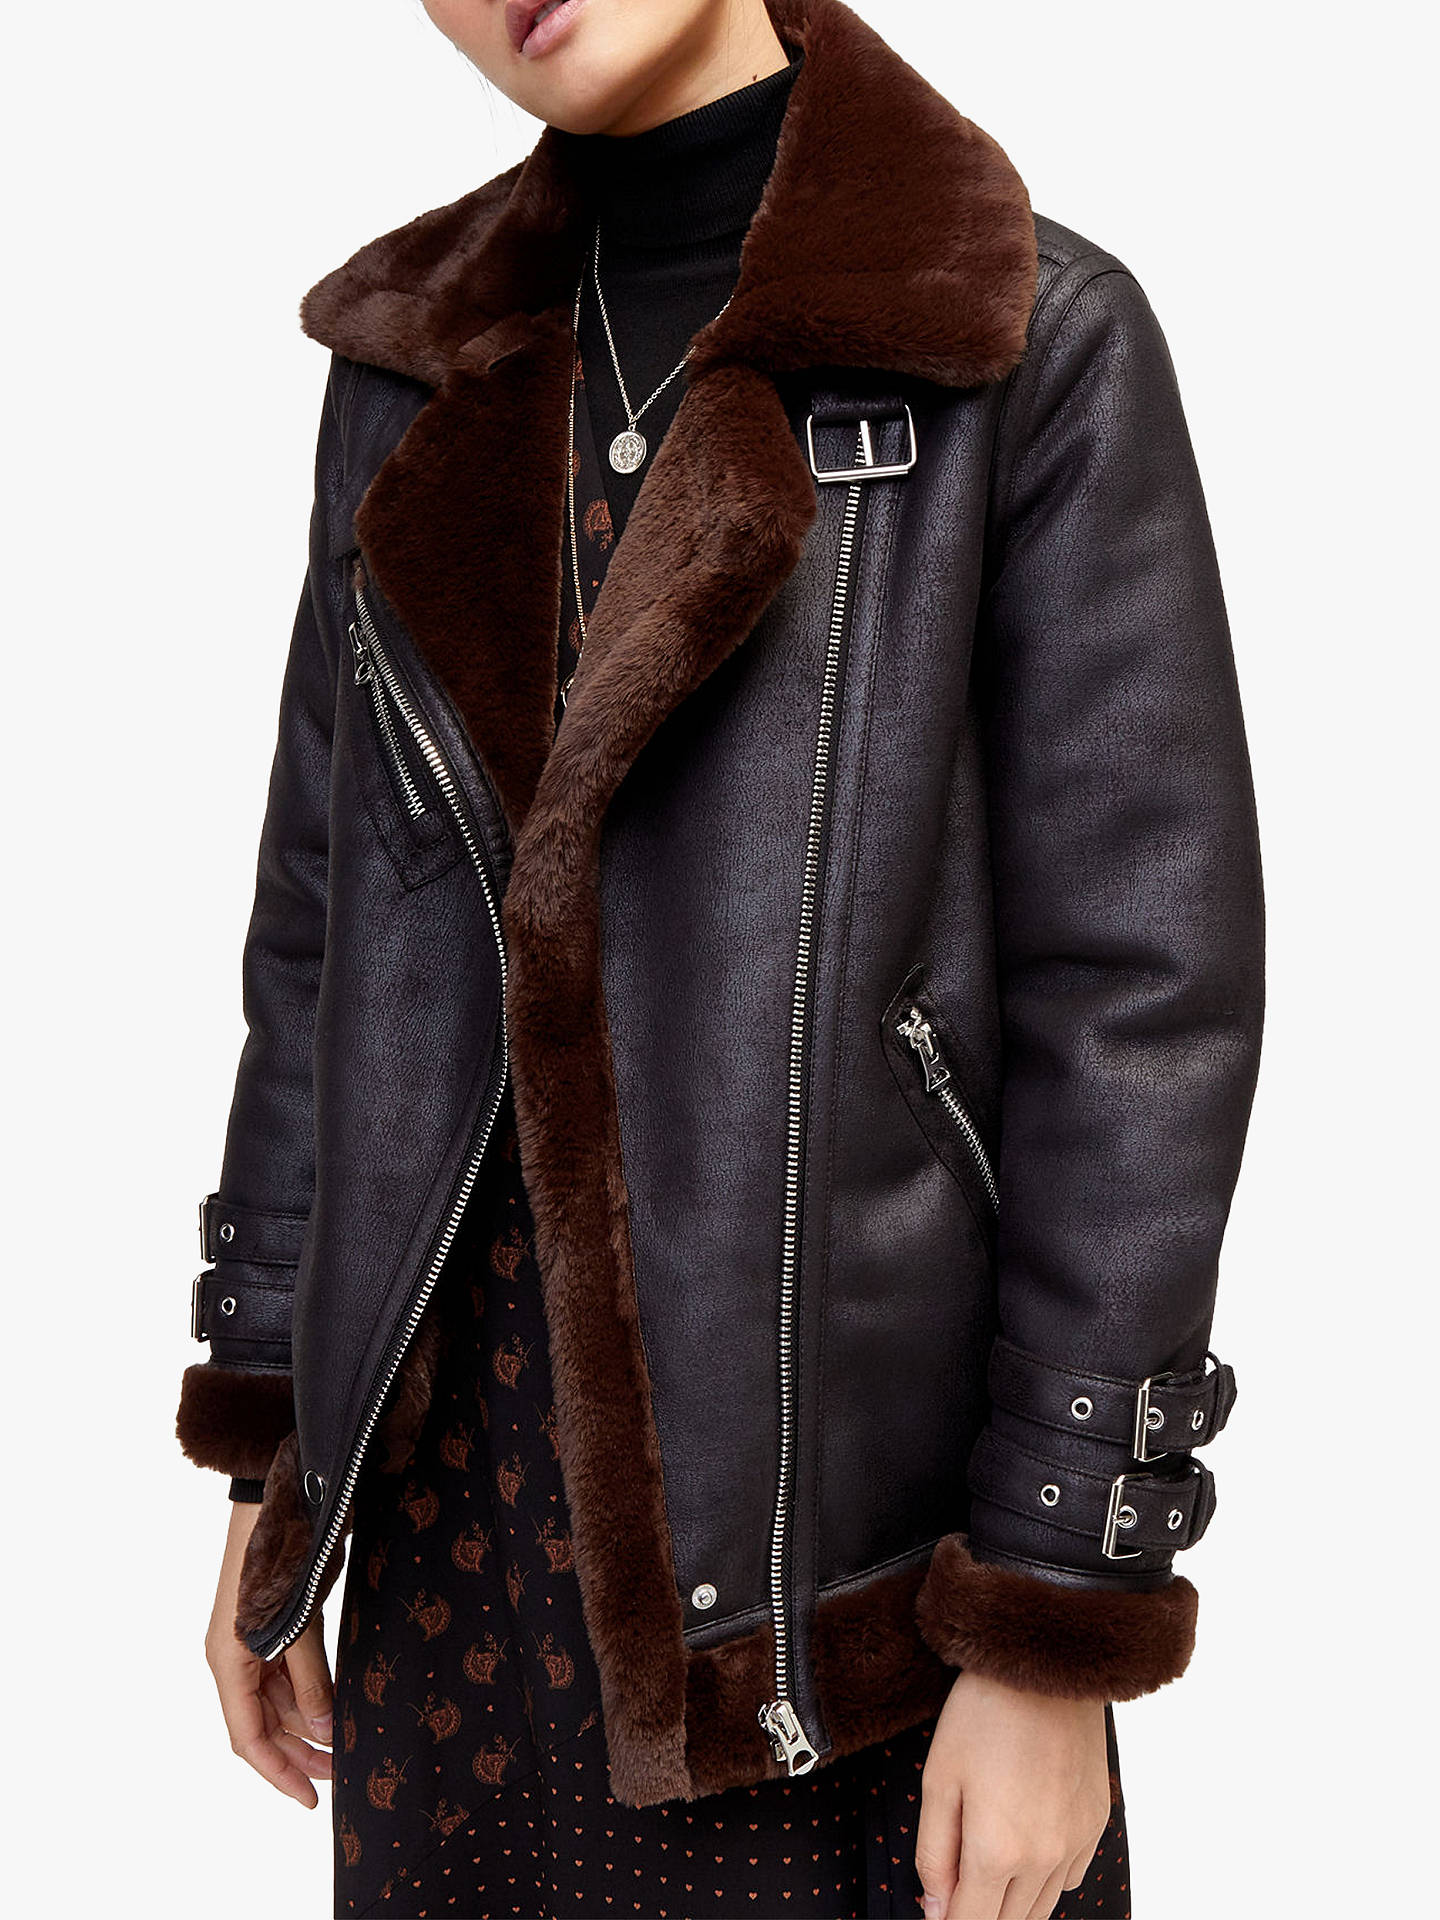 00b0e78f8 Warehouse Faux Leather Oversized Biker Jacket at John Lewis & Partners